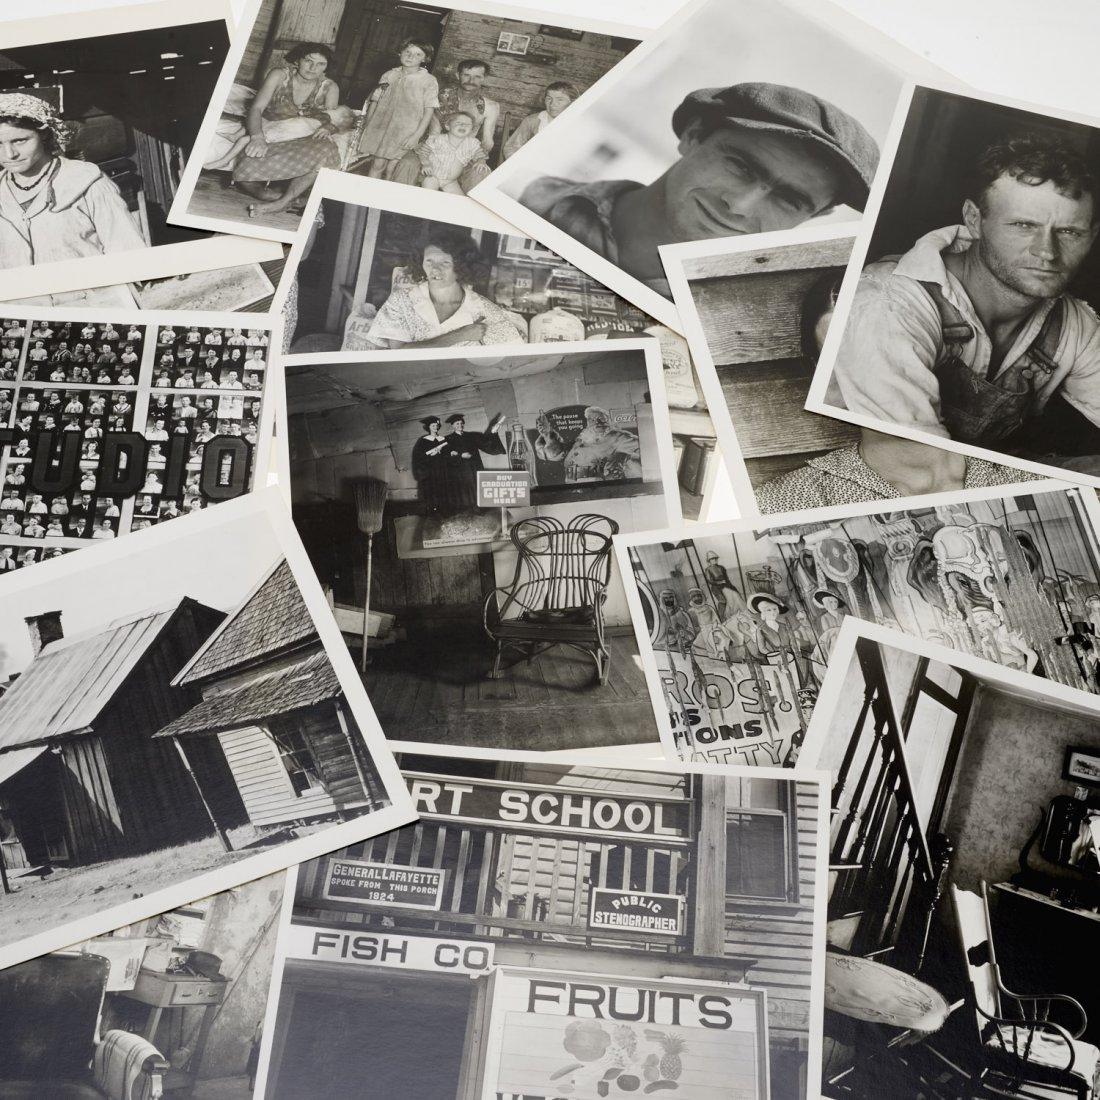 Walker Evans, portfolio (15) photographic prints